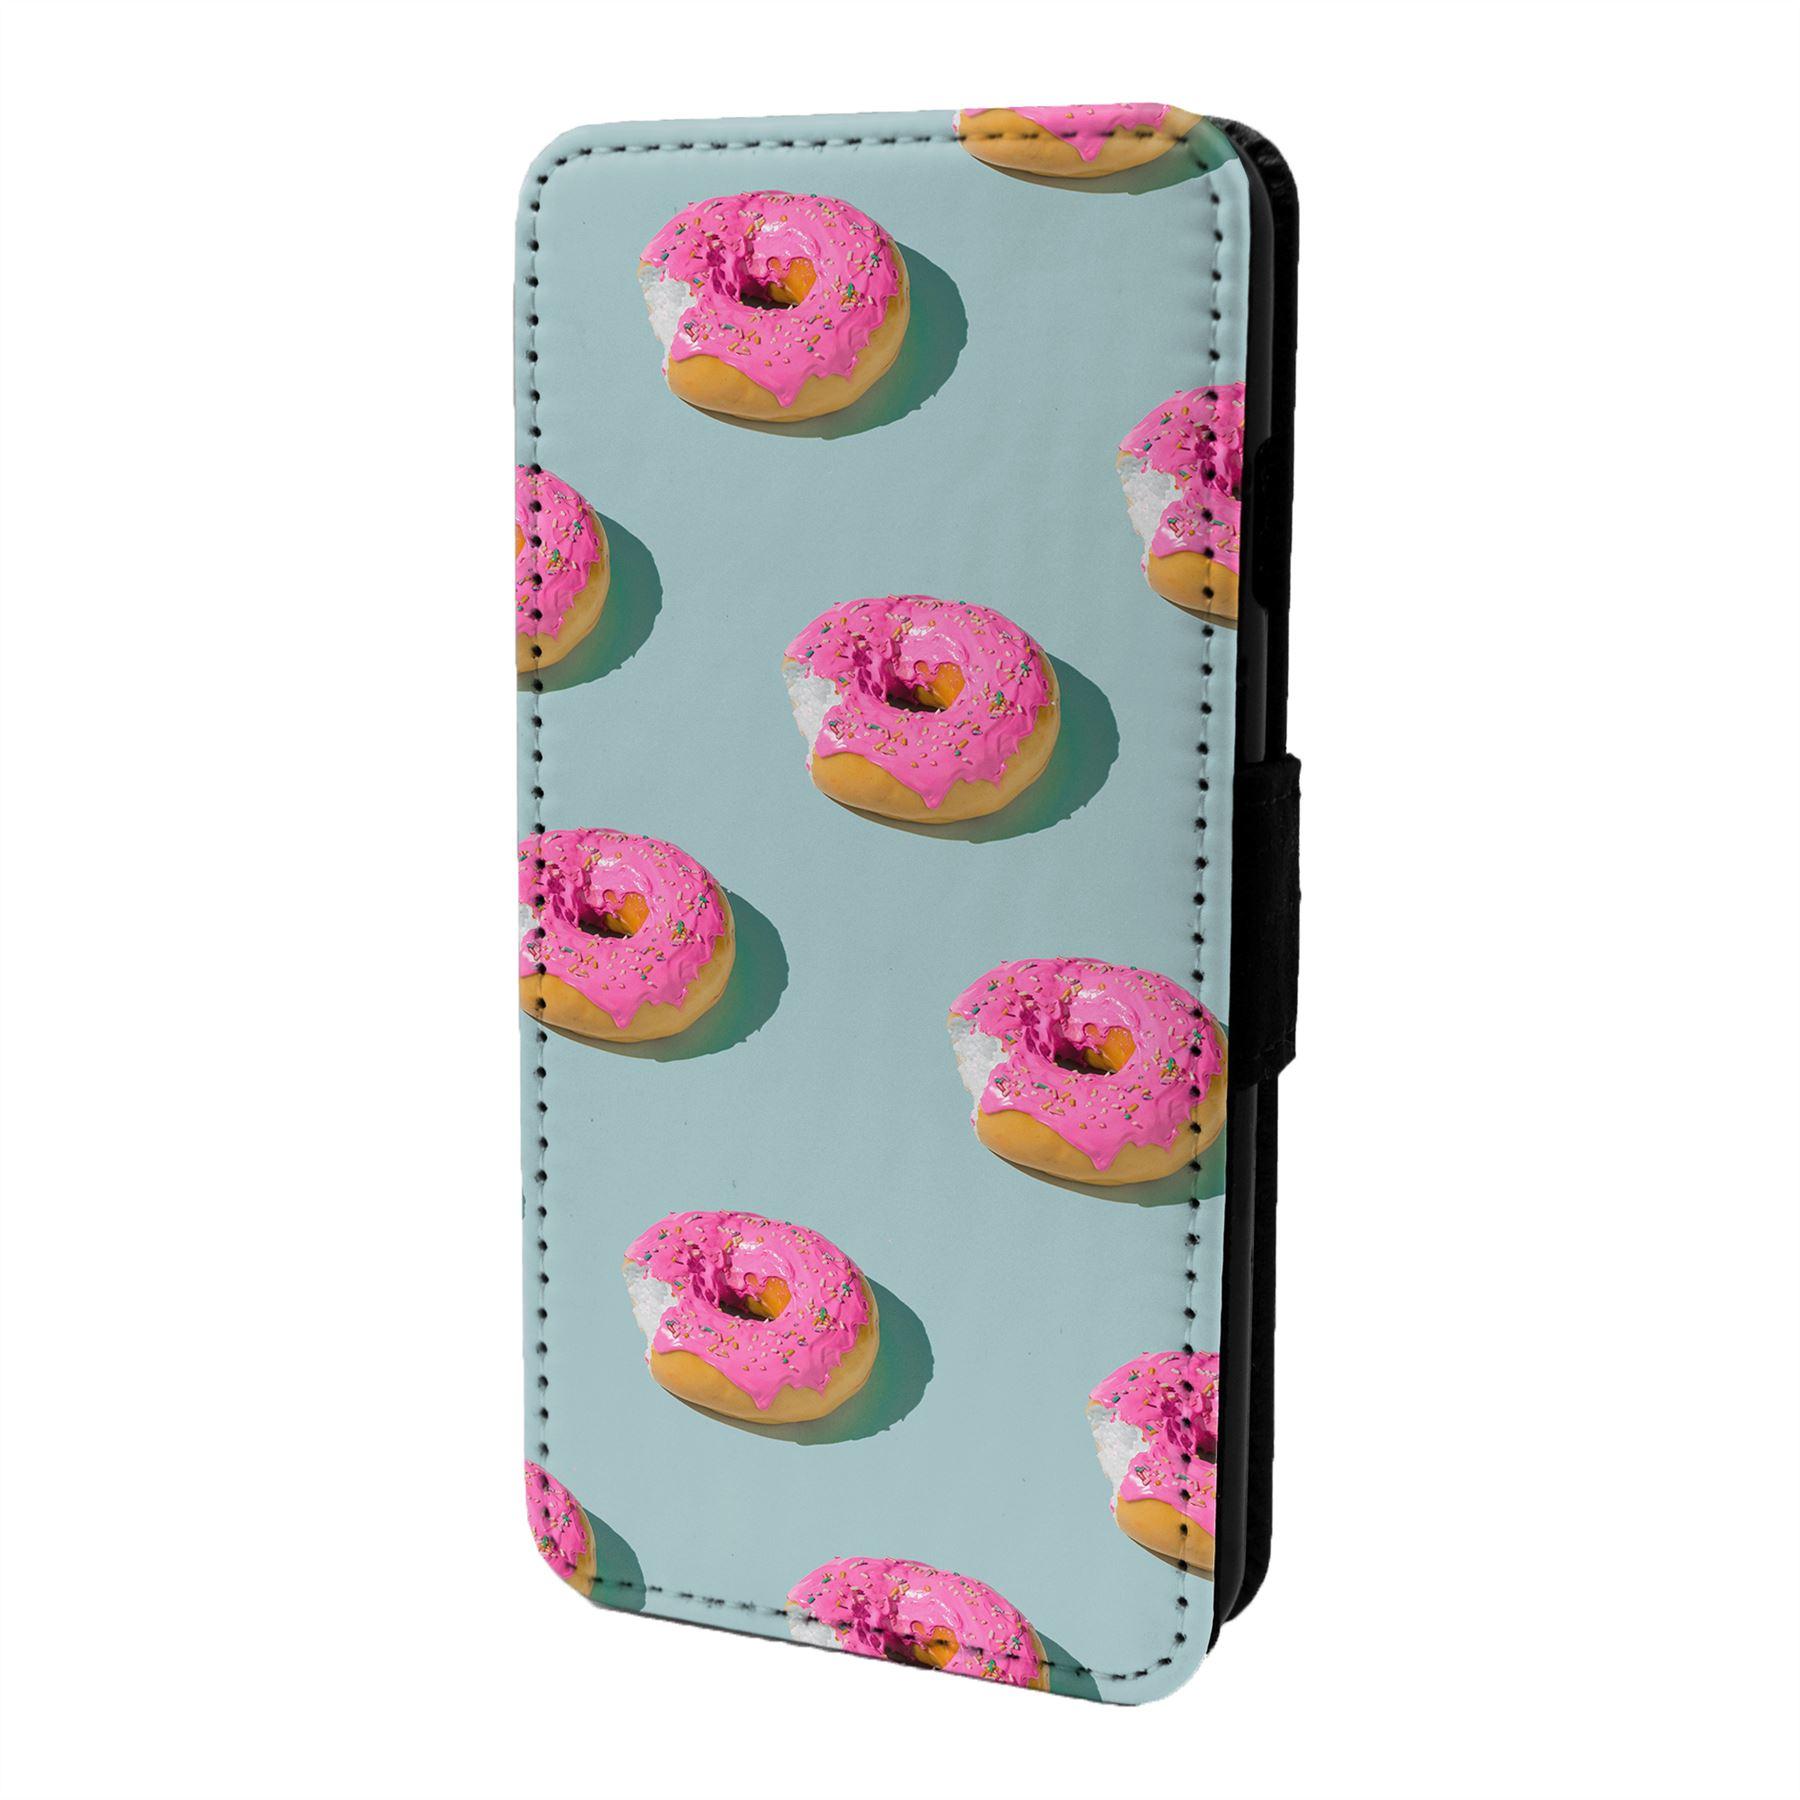 Pastel-Donut-Funda-Libro-para-Telefono-Movil-S7015